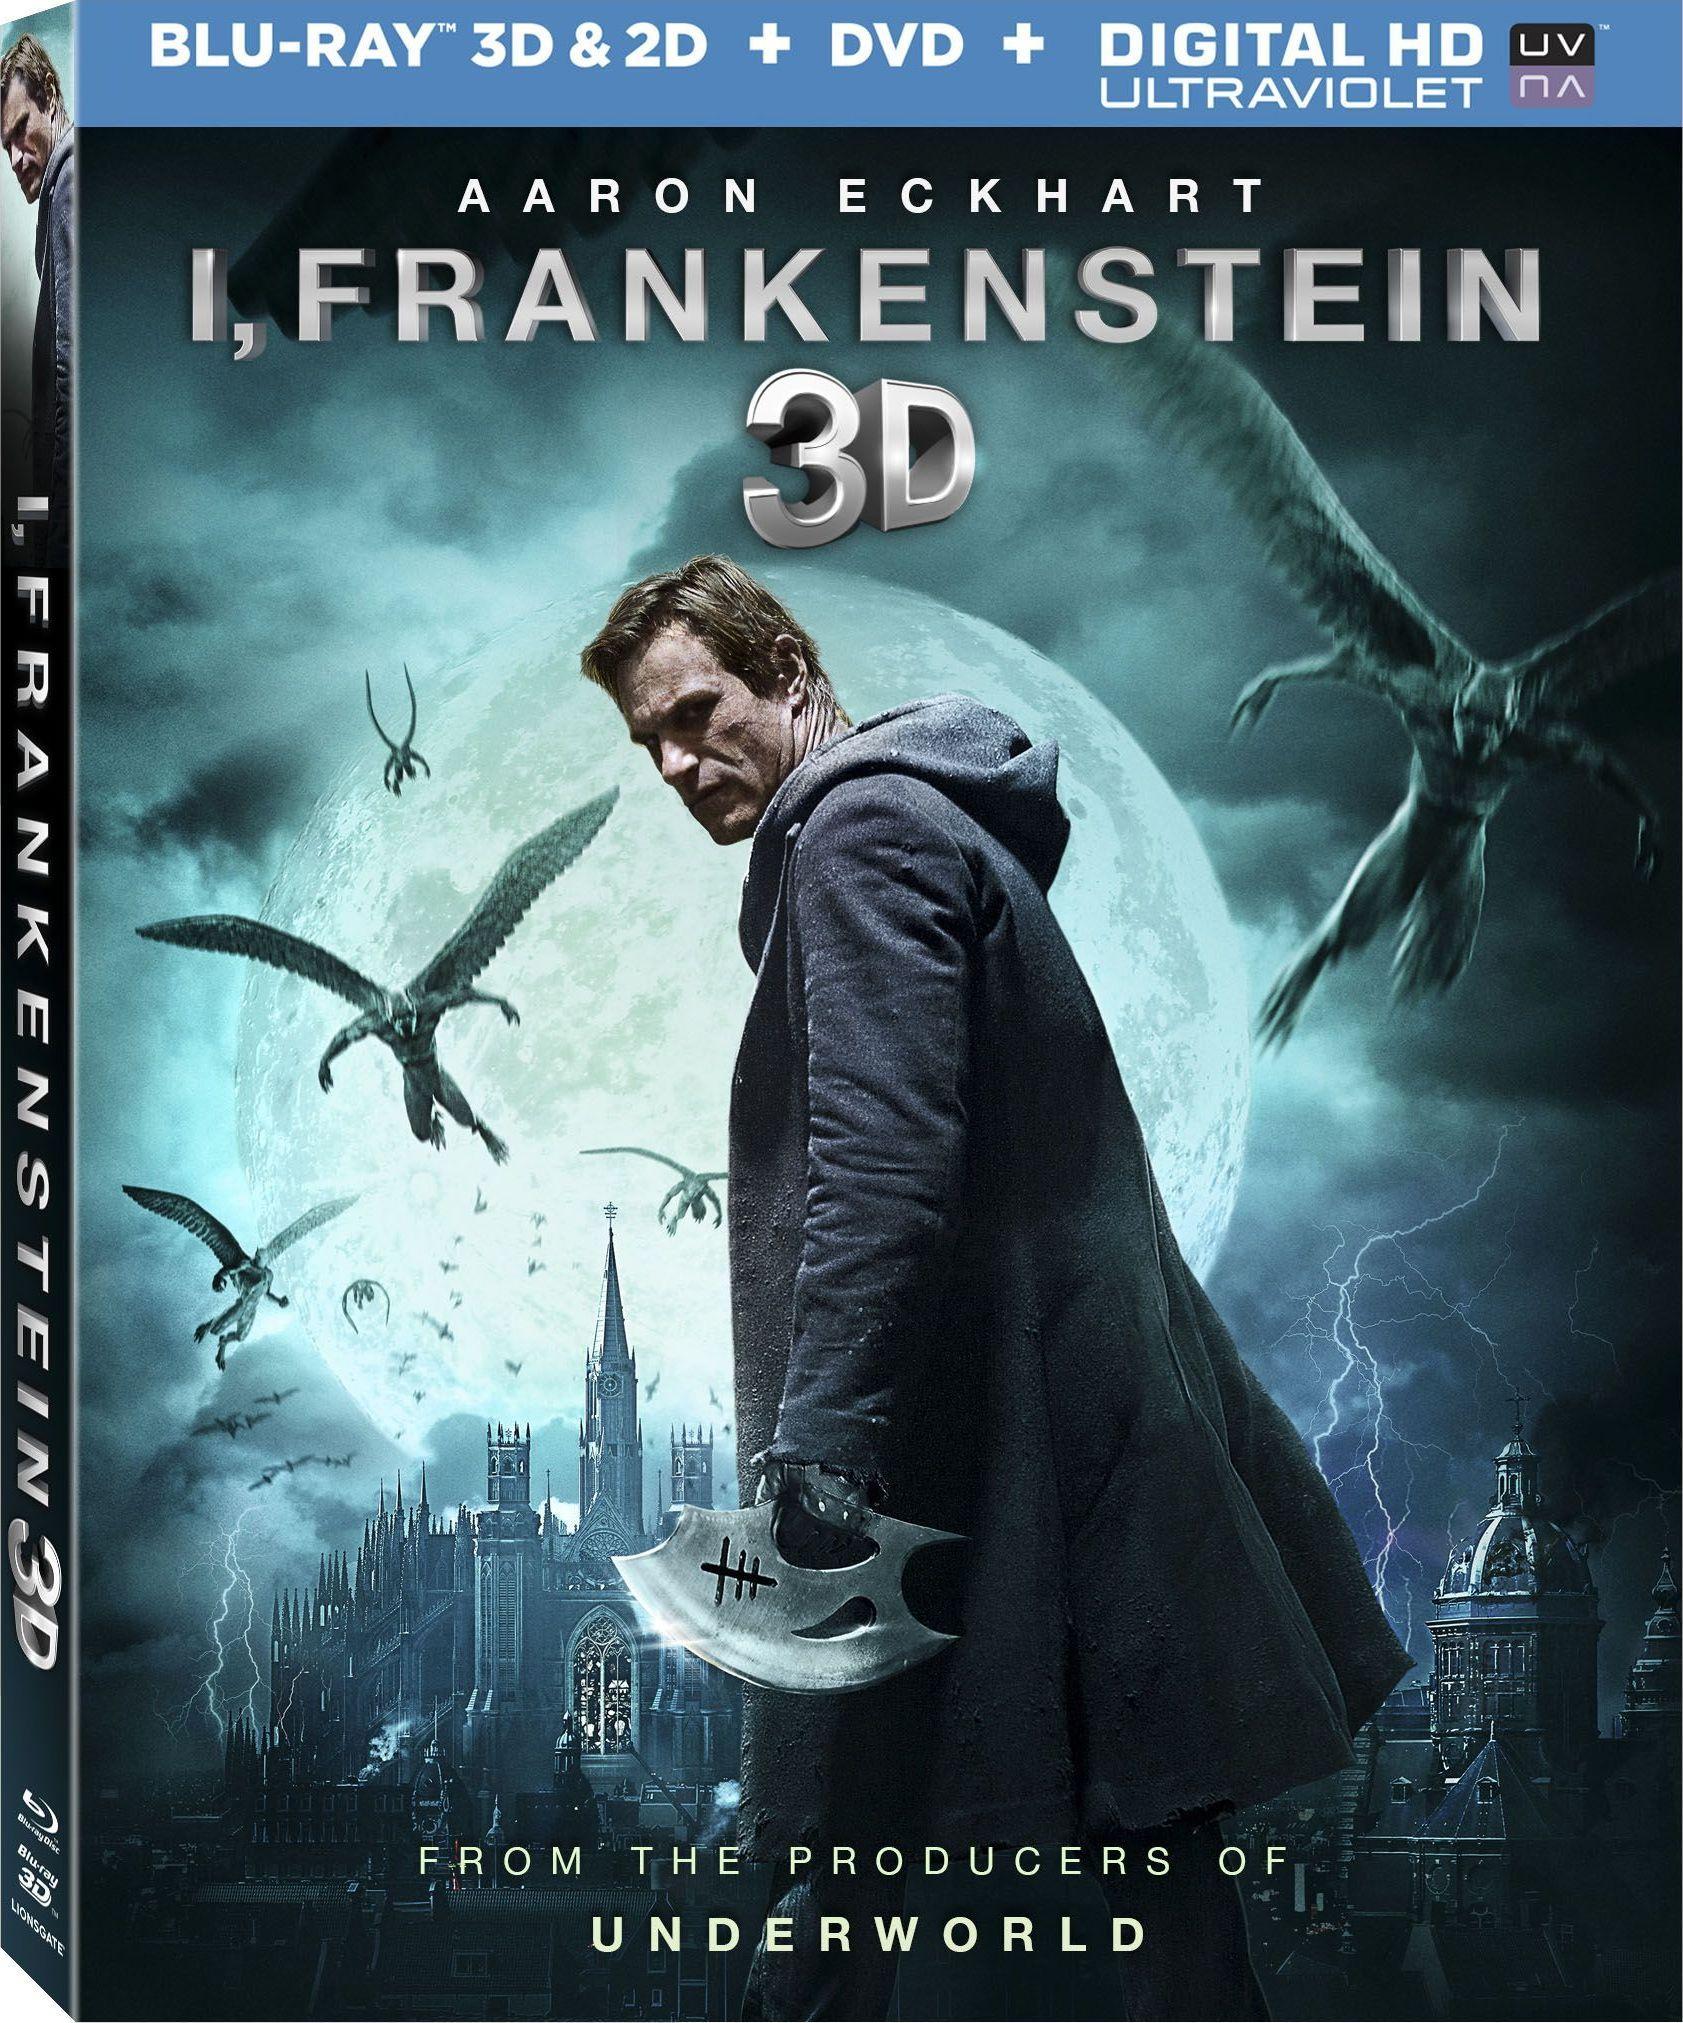 i, frankenstein blu-ray review | film stars aaron eckhart | collider